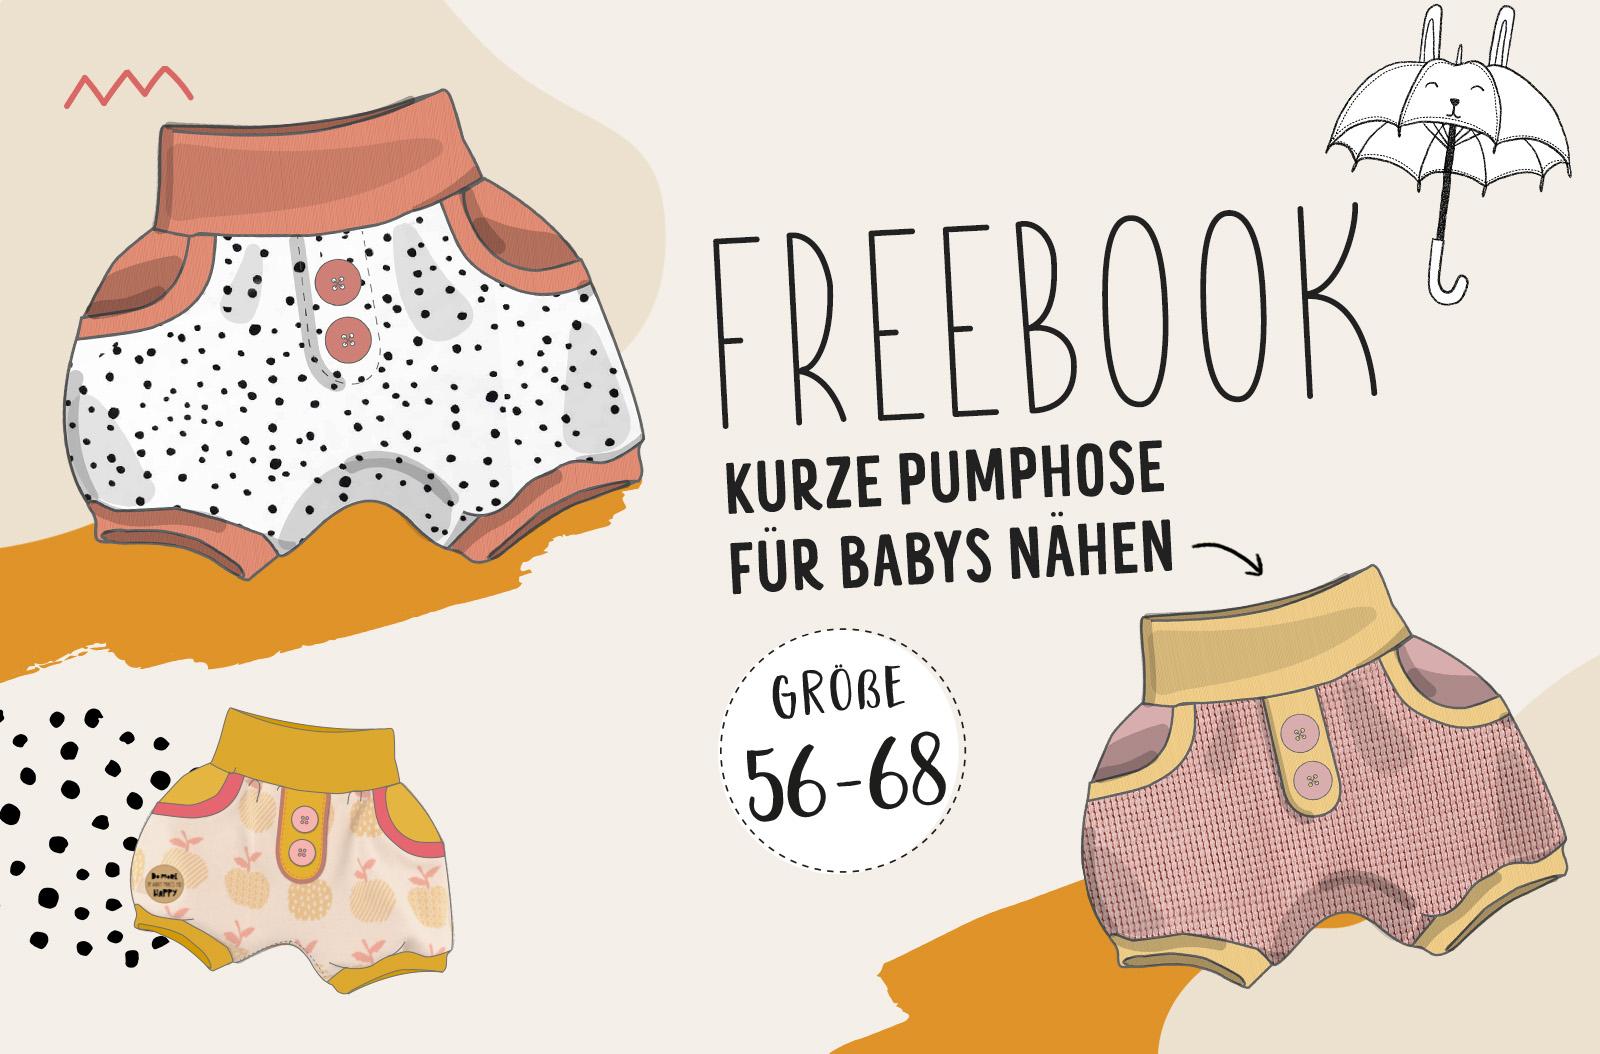 FREEBOOK: kurze Baby Pumphose 2.0